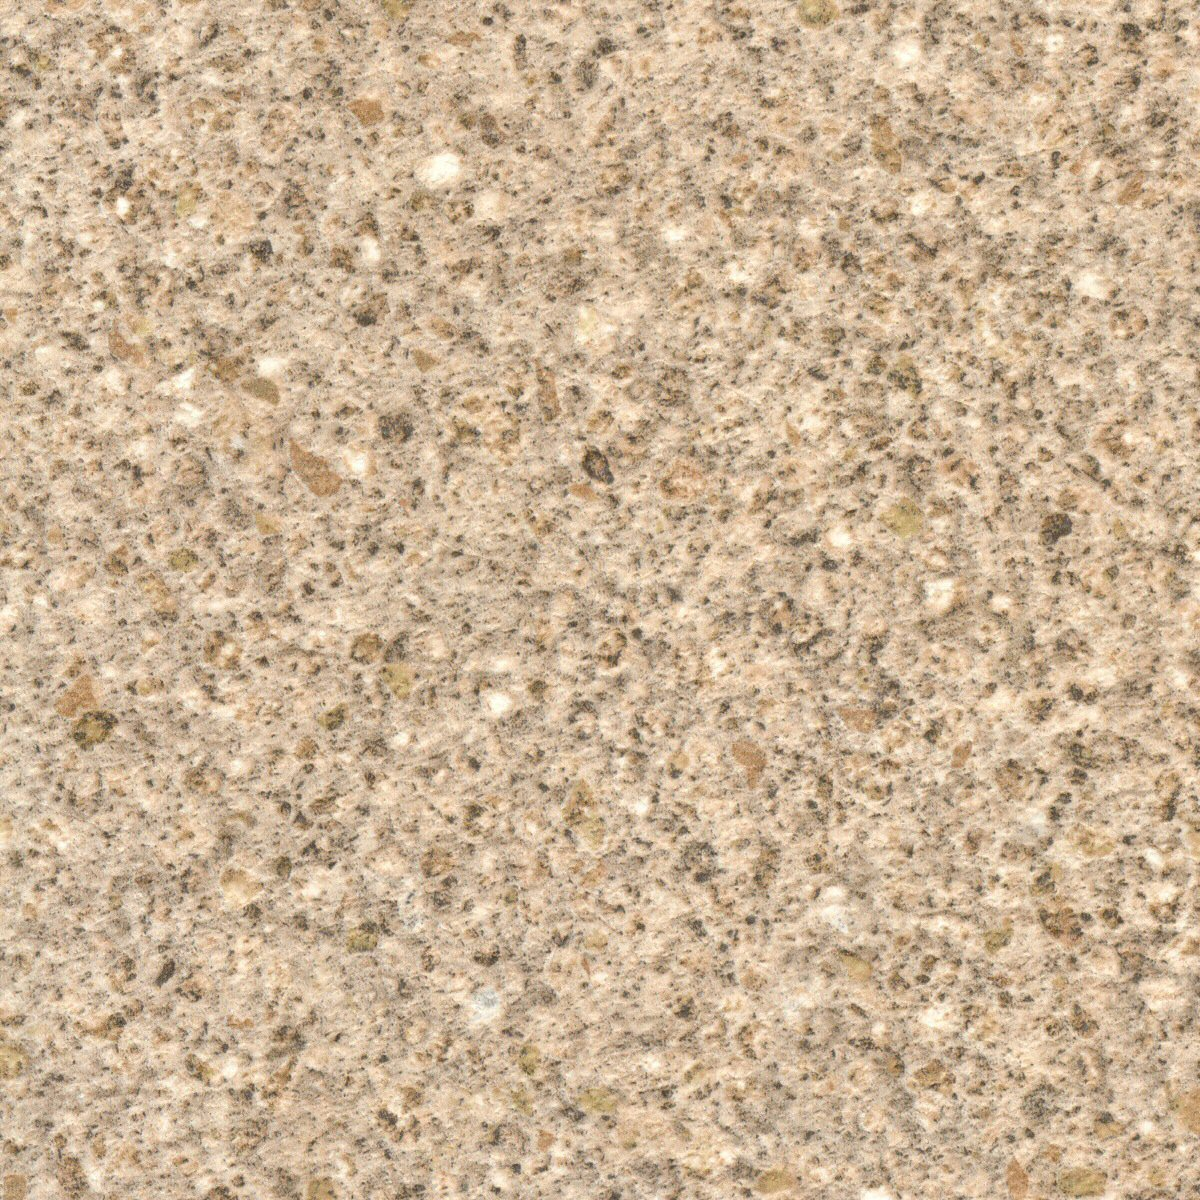 taurus sand worktop 2m